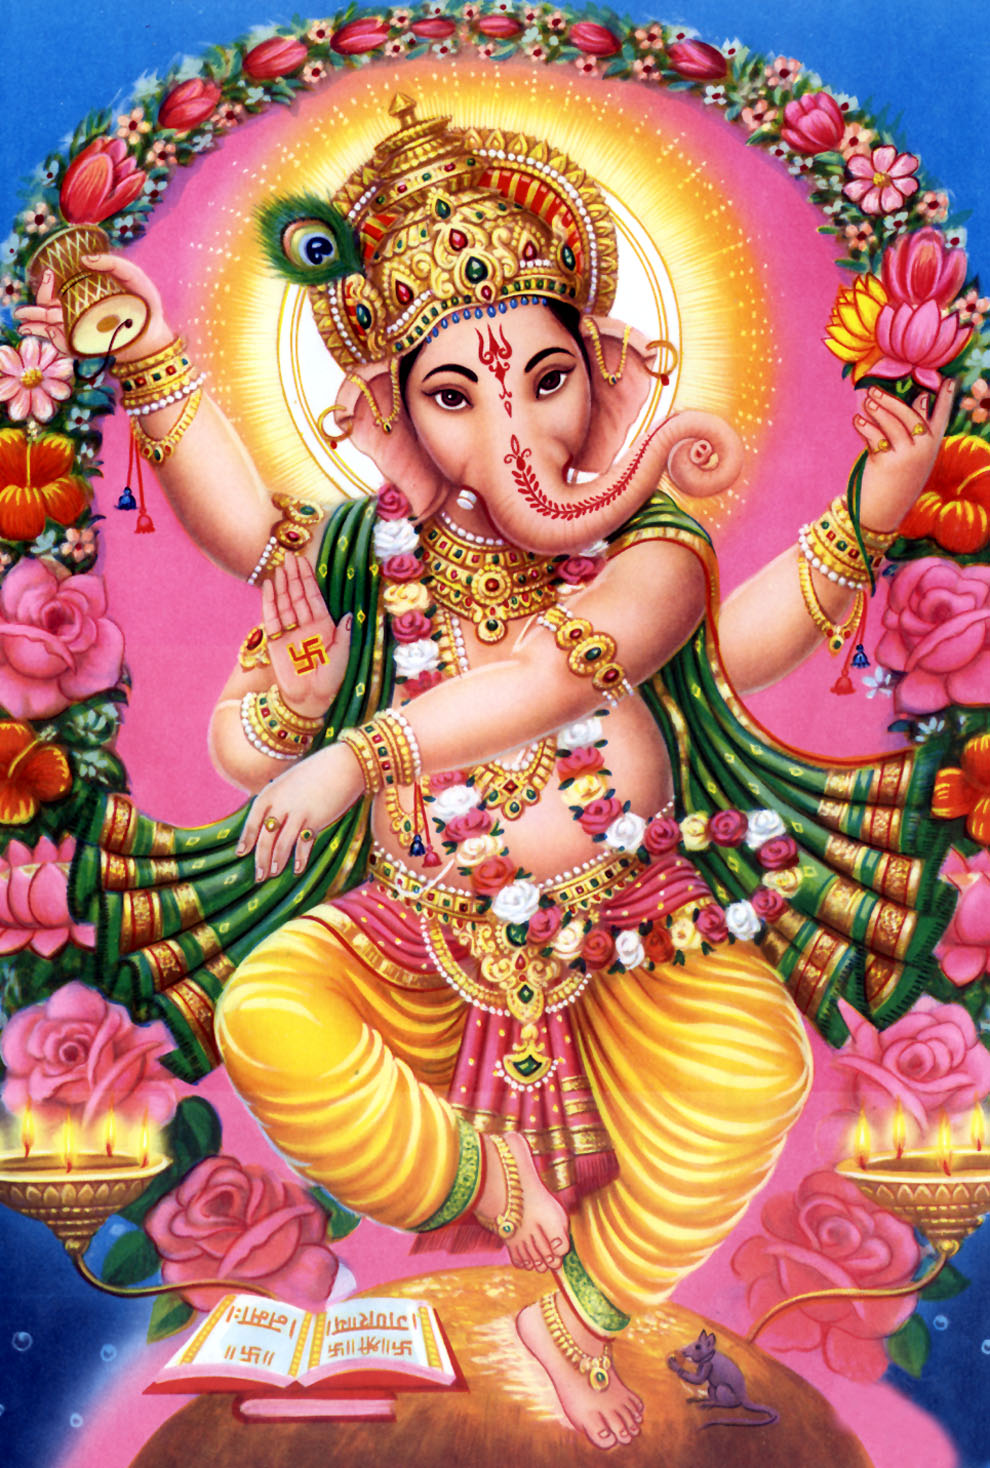 God photos lord shri ganesh latest hd wallpapers gallery - Shri ganesh hd photo ...